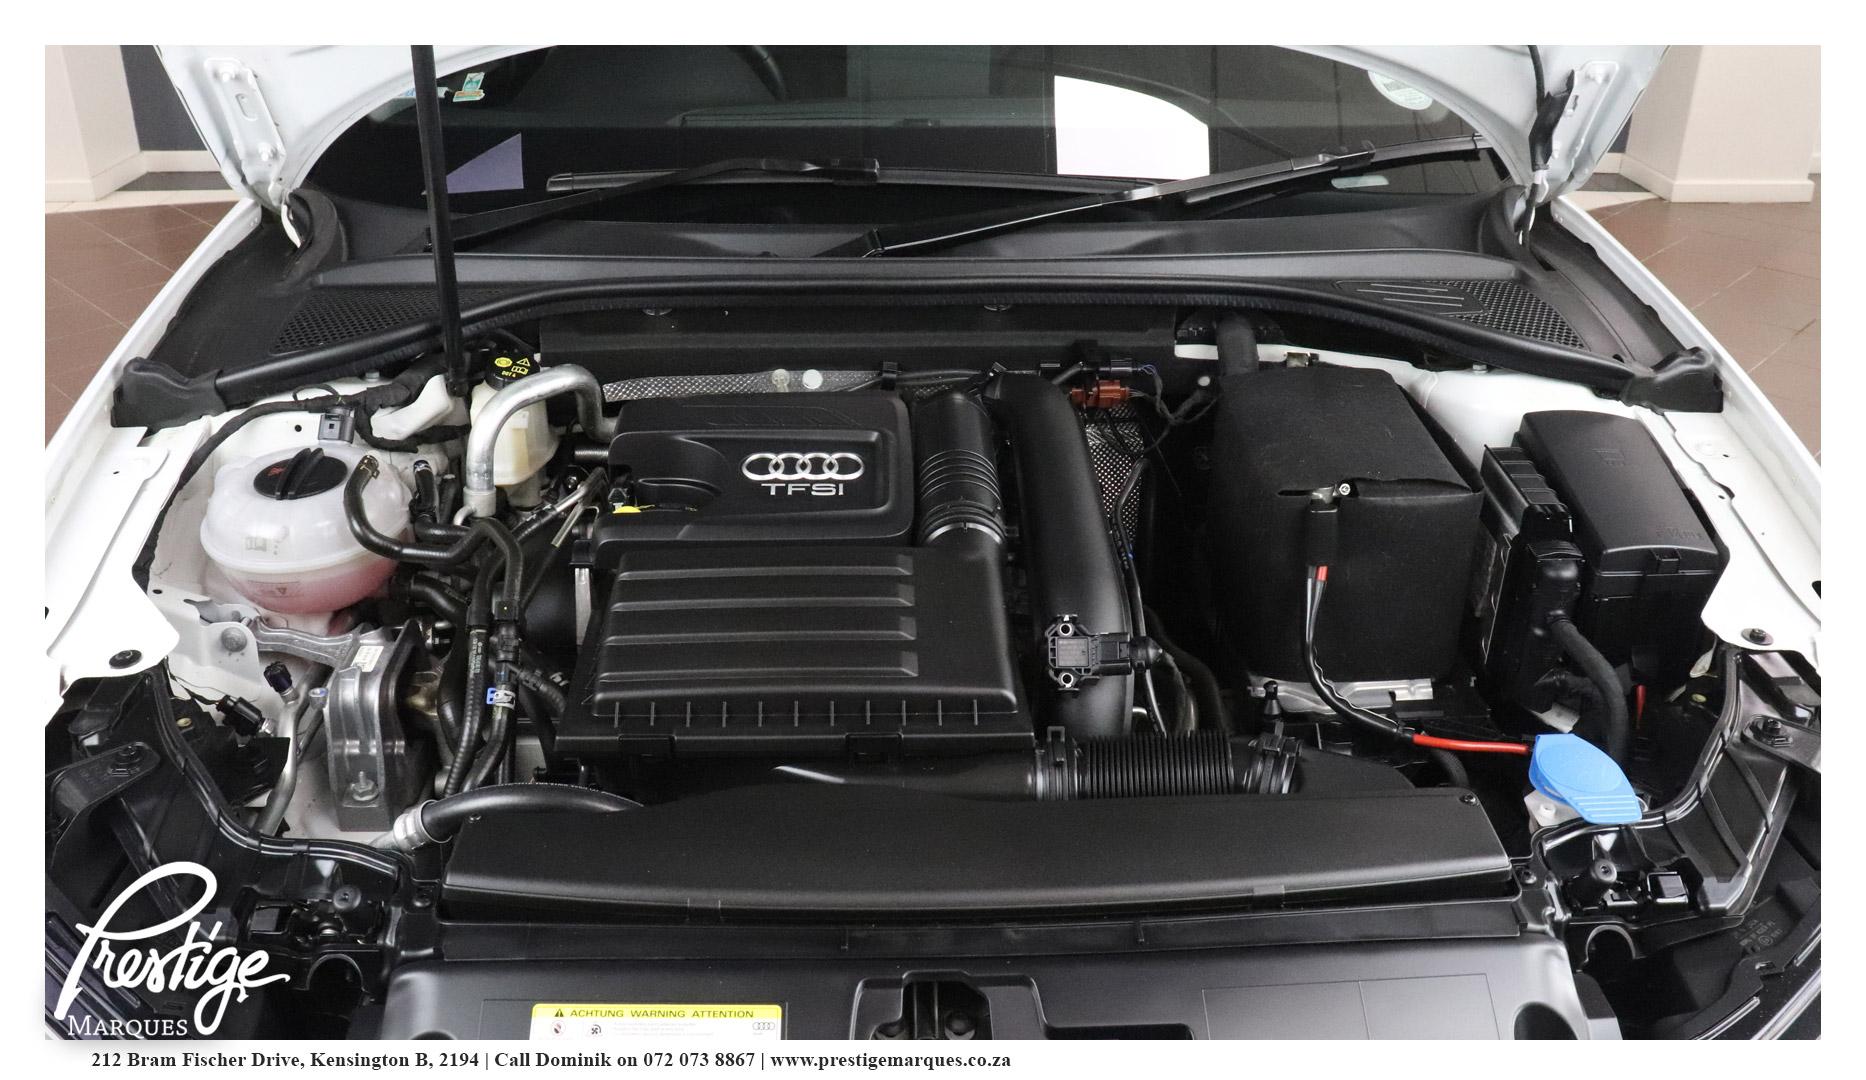 2017-Audi-A3-Sportback-1-4-TFSi-Stronic-Prestige-Marques-Randburg-Sandton-10